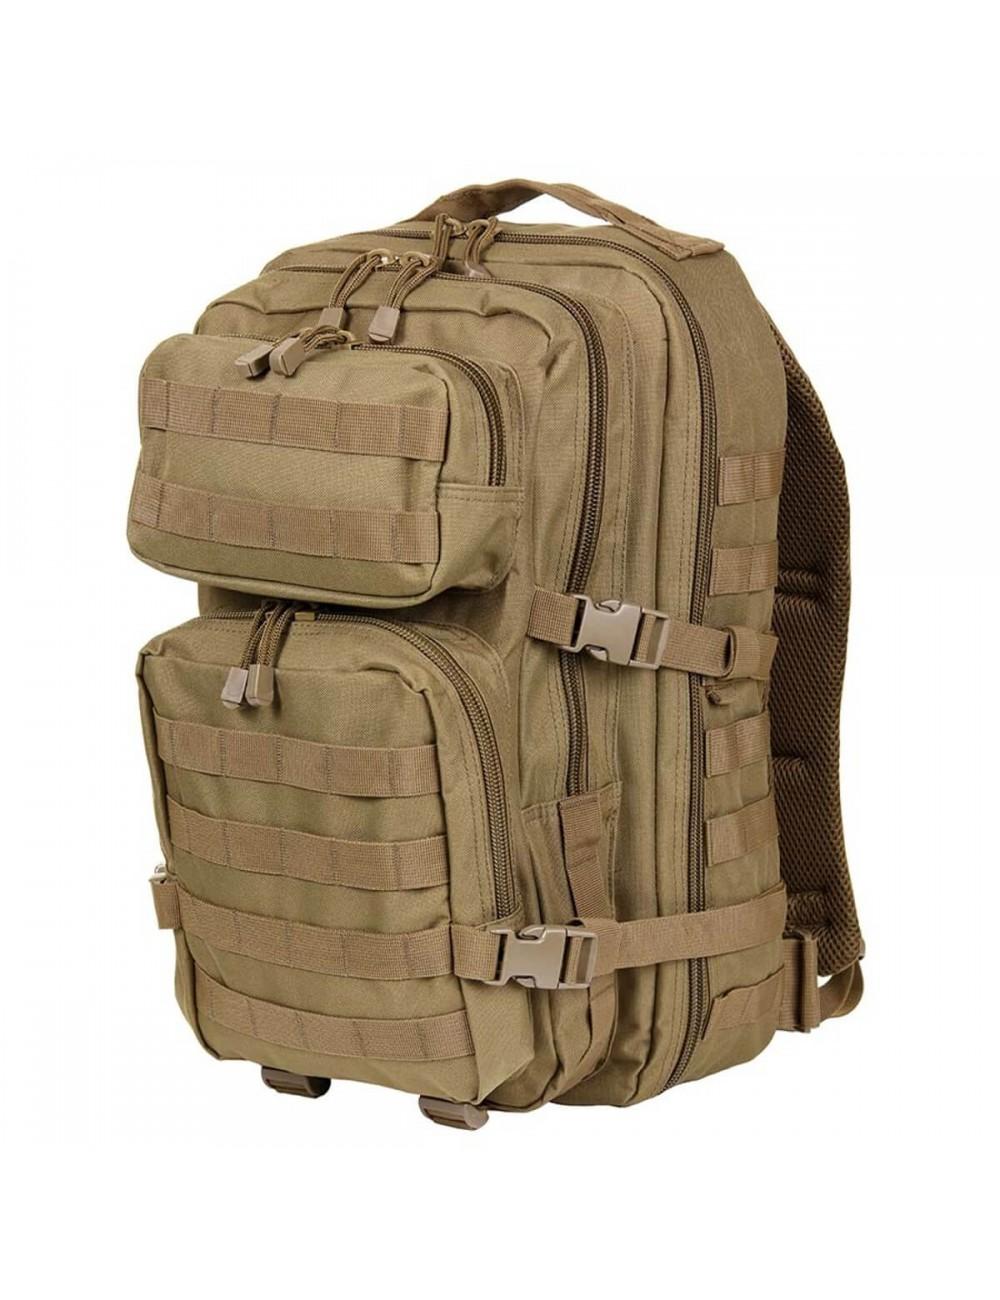 101 Inc Mountain backpack 45 liter US leger model - Coyote